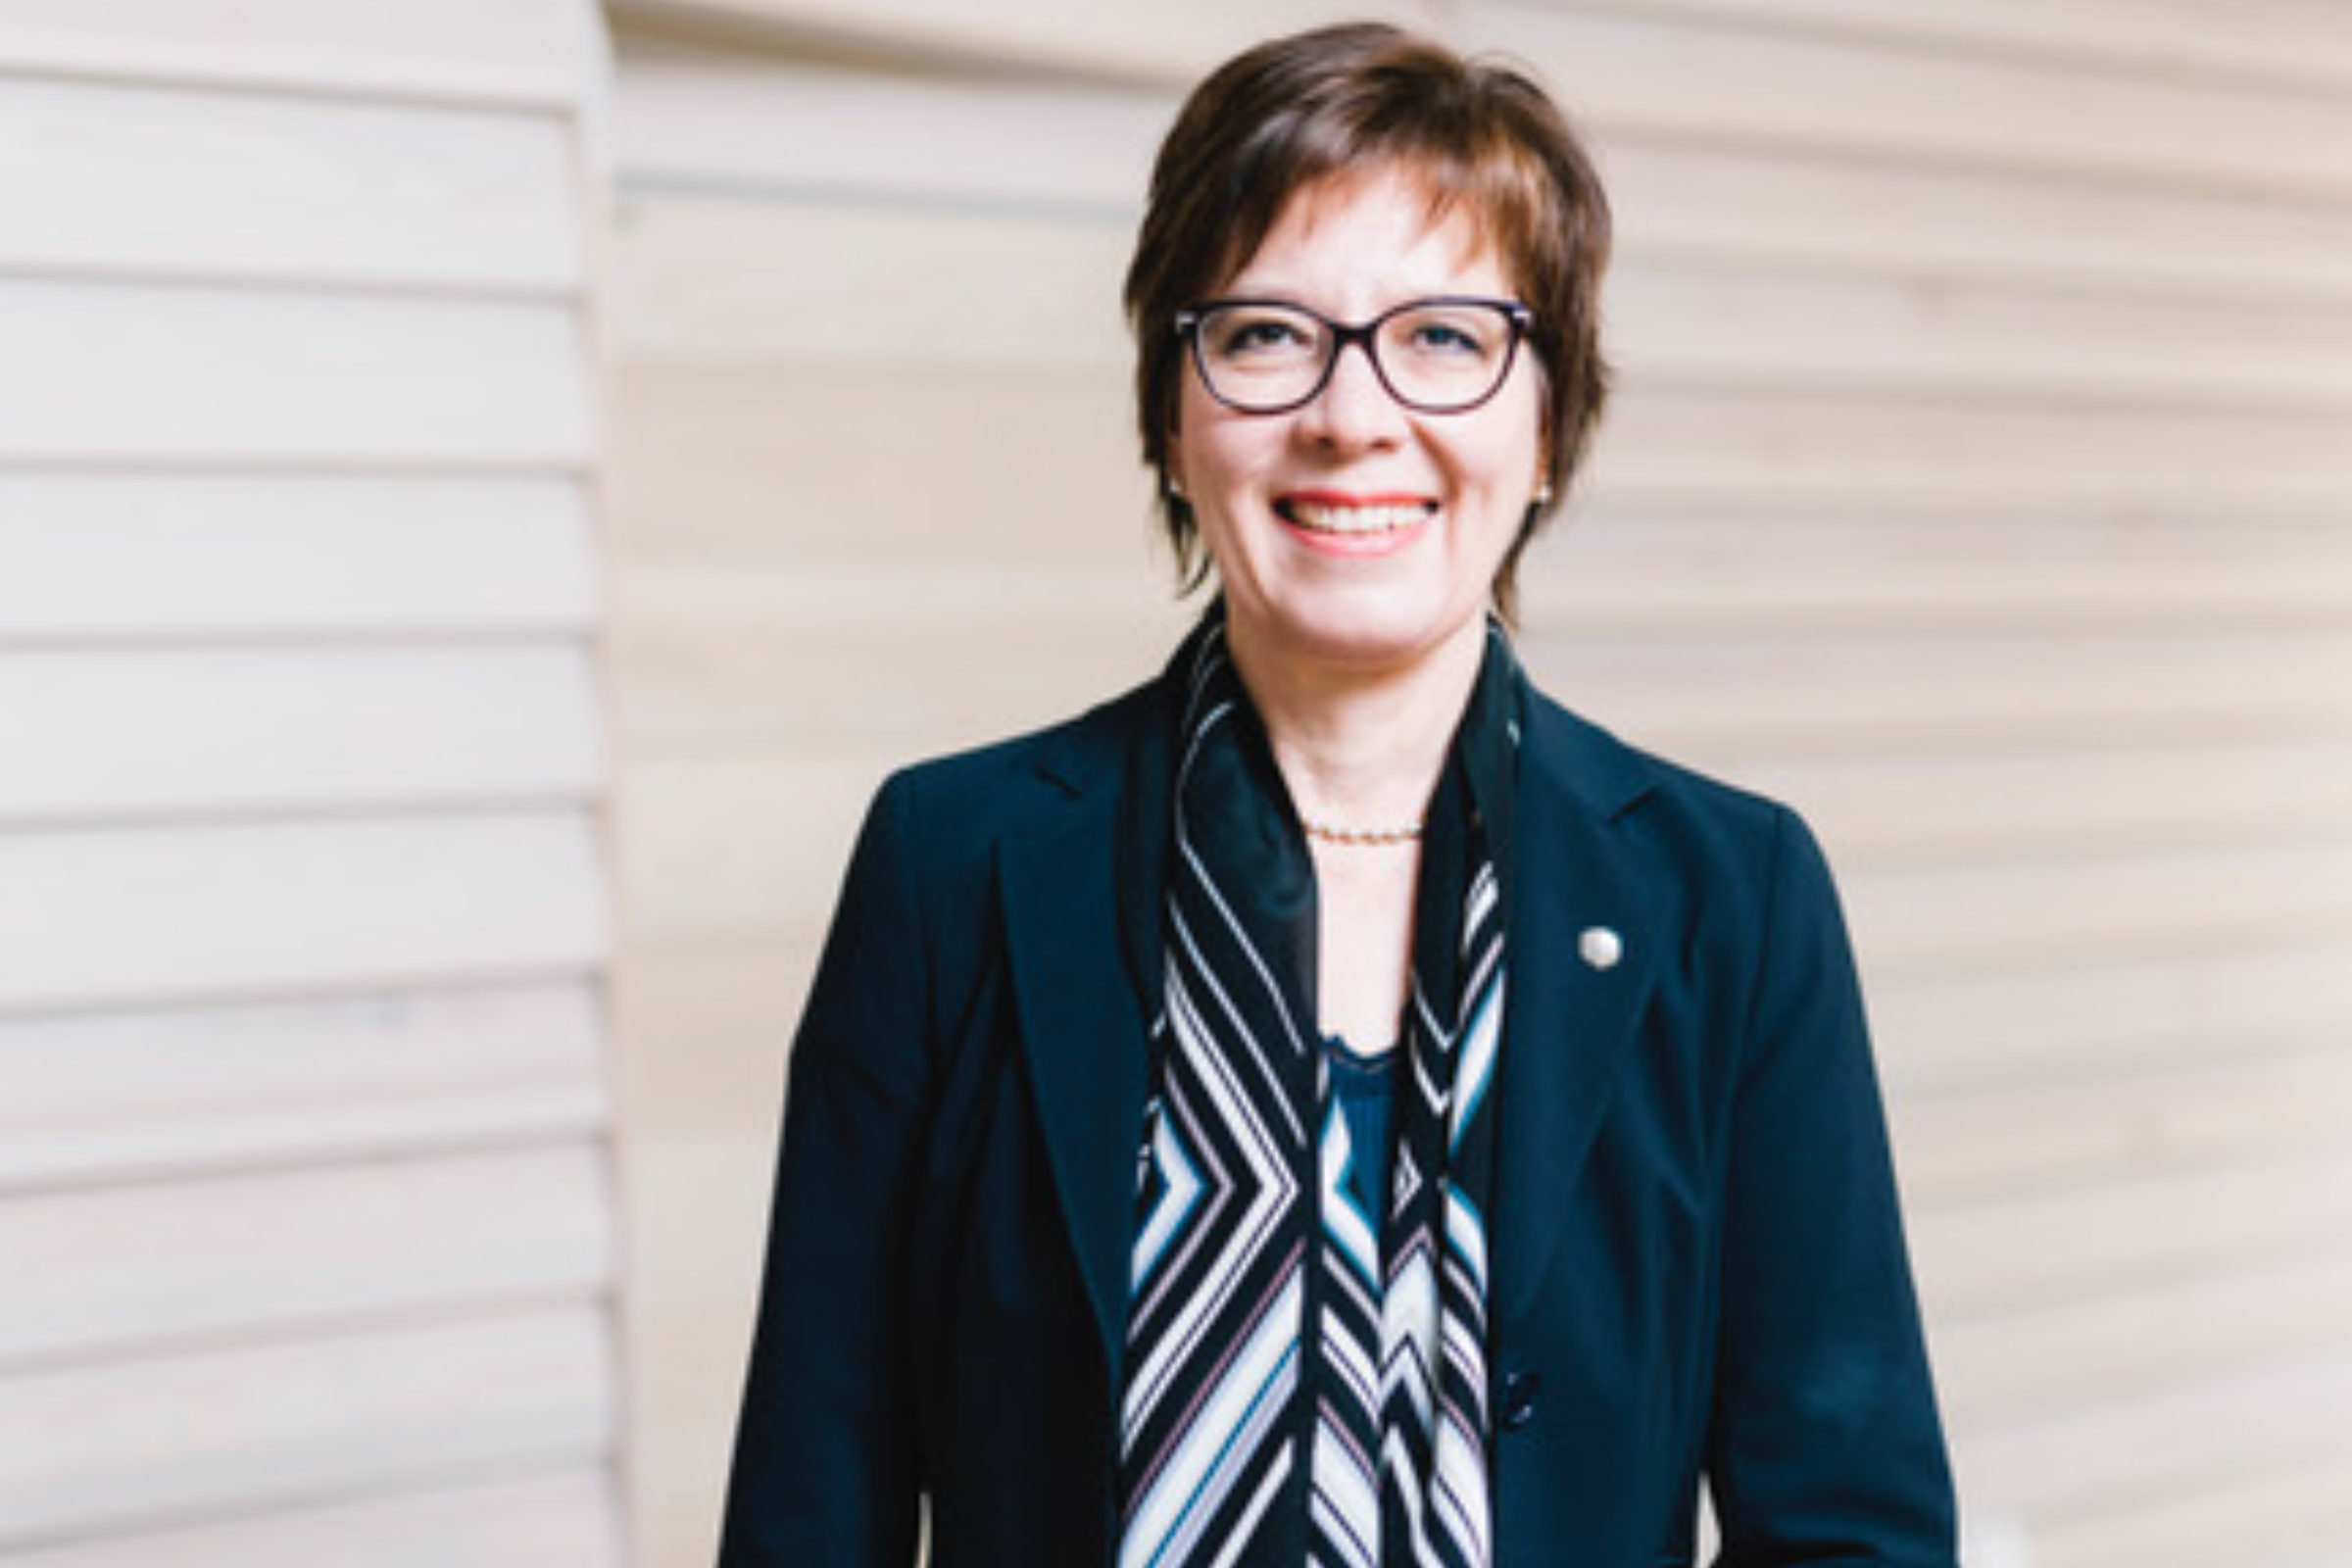 Dr. Tuija Pulkkinen named next CLaSP department chair